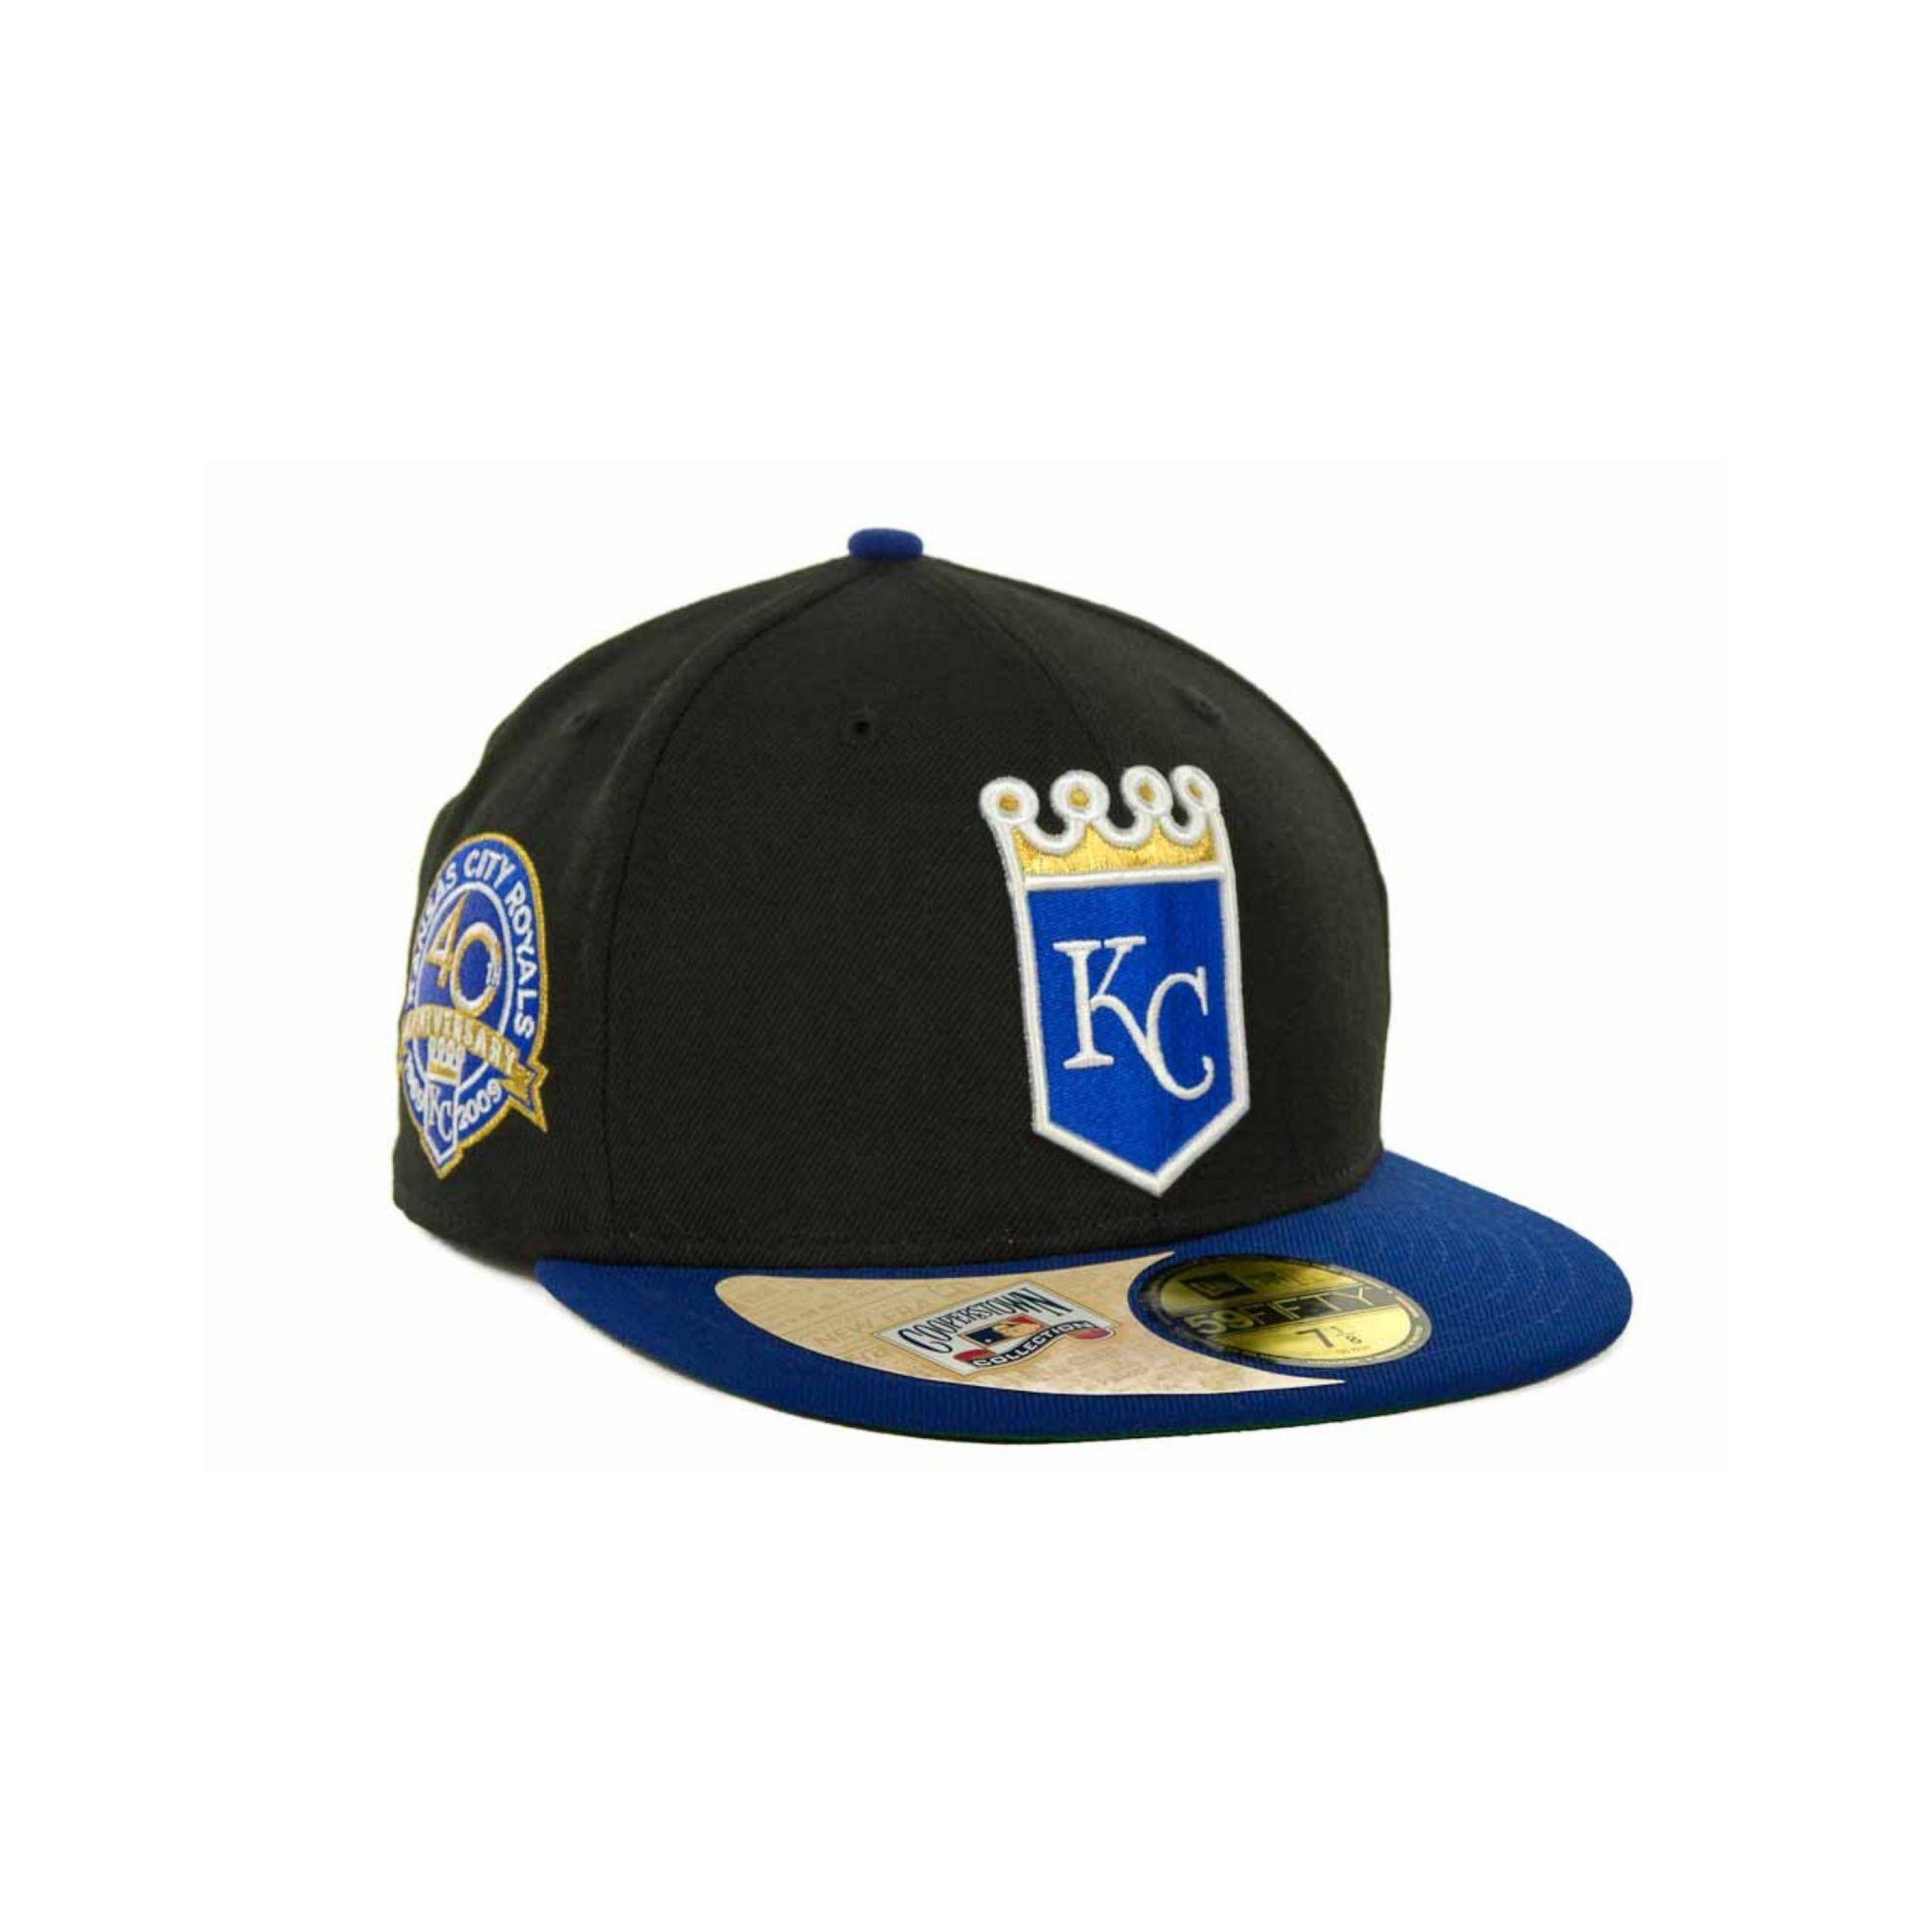 ... sale lyst ktz kansas city royals cooperstown patch 59fifty cap in black  4299d b8386 8628eb4034a6